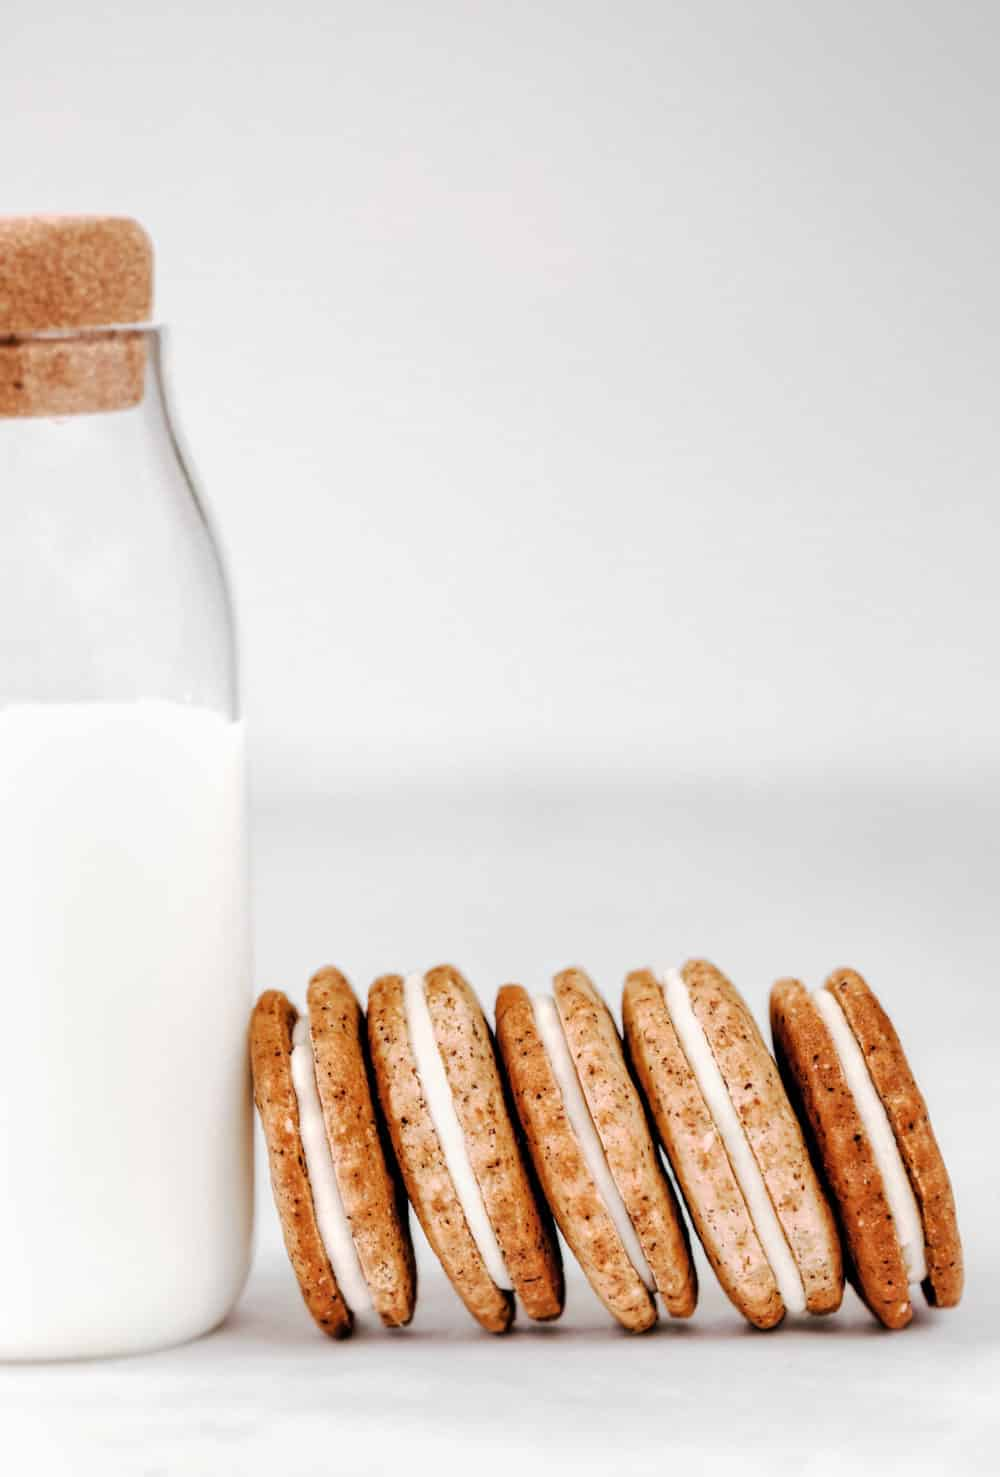 White chocolate sandwich cookies